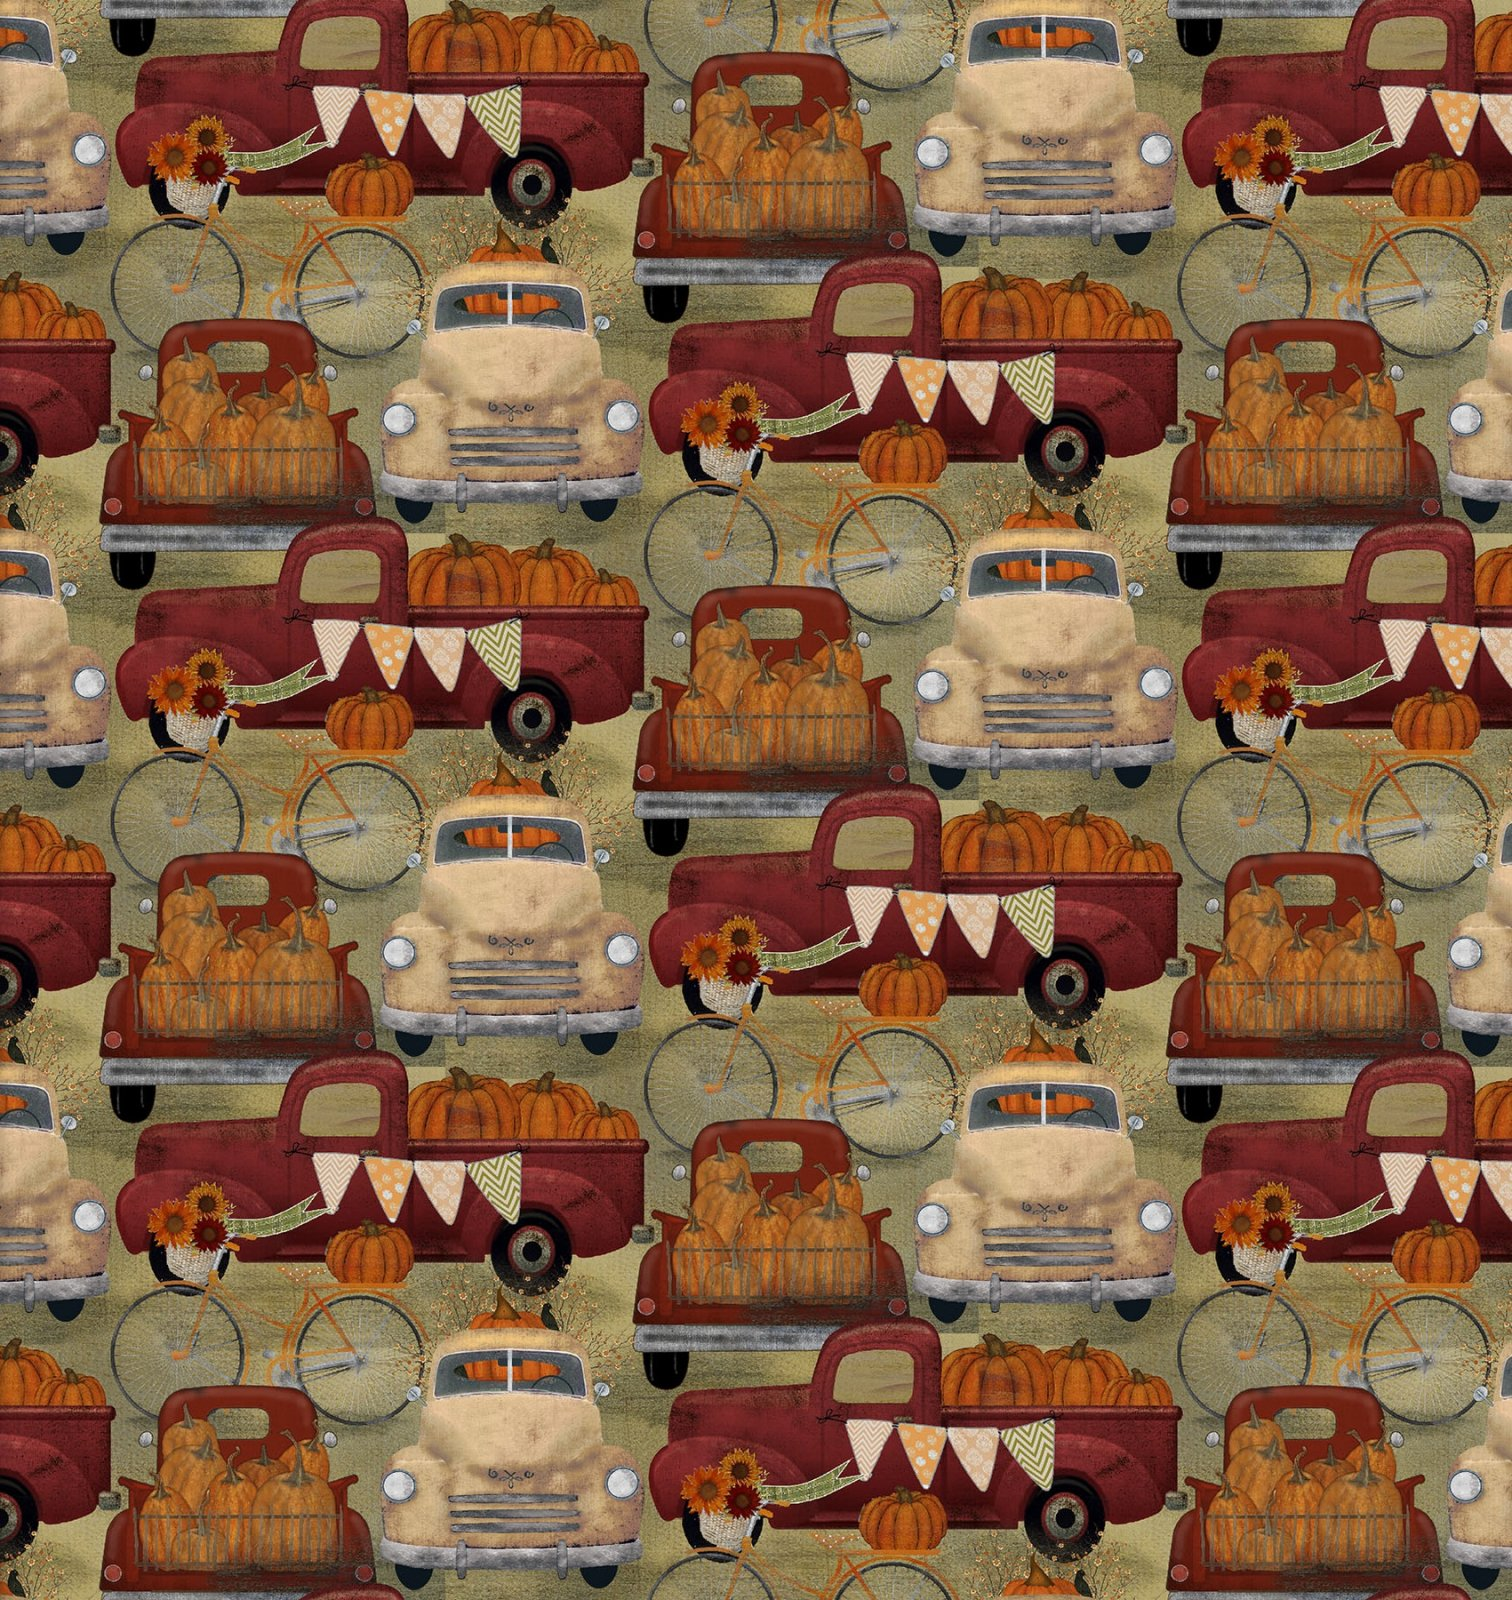 3 Wishes Harvest Campers 16636 Tan Truck Hauling Pumpkins